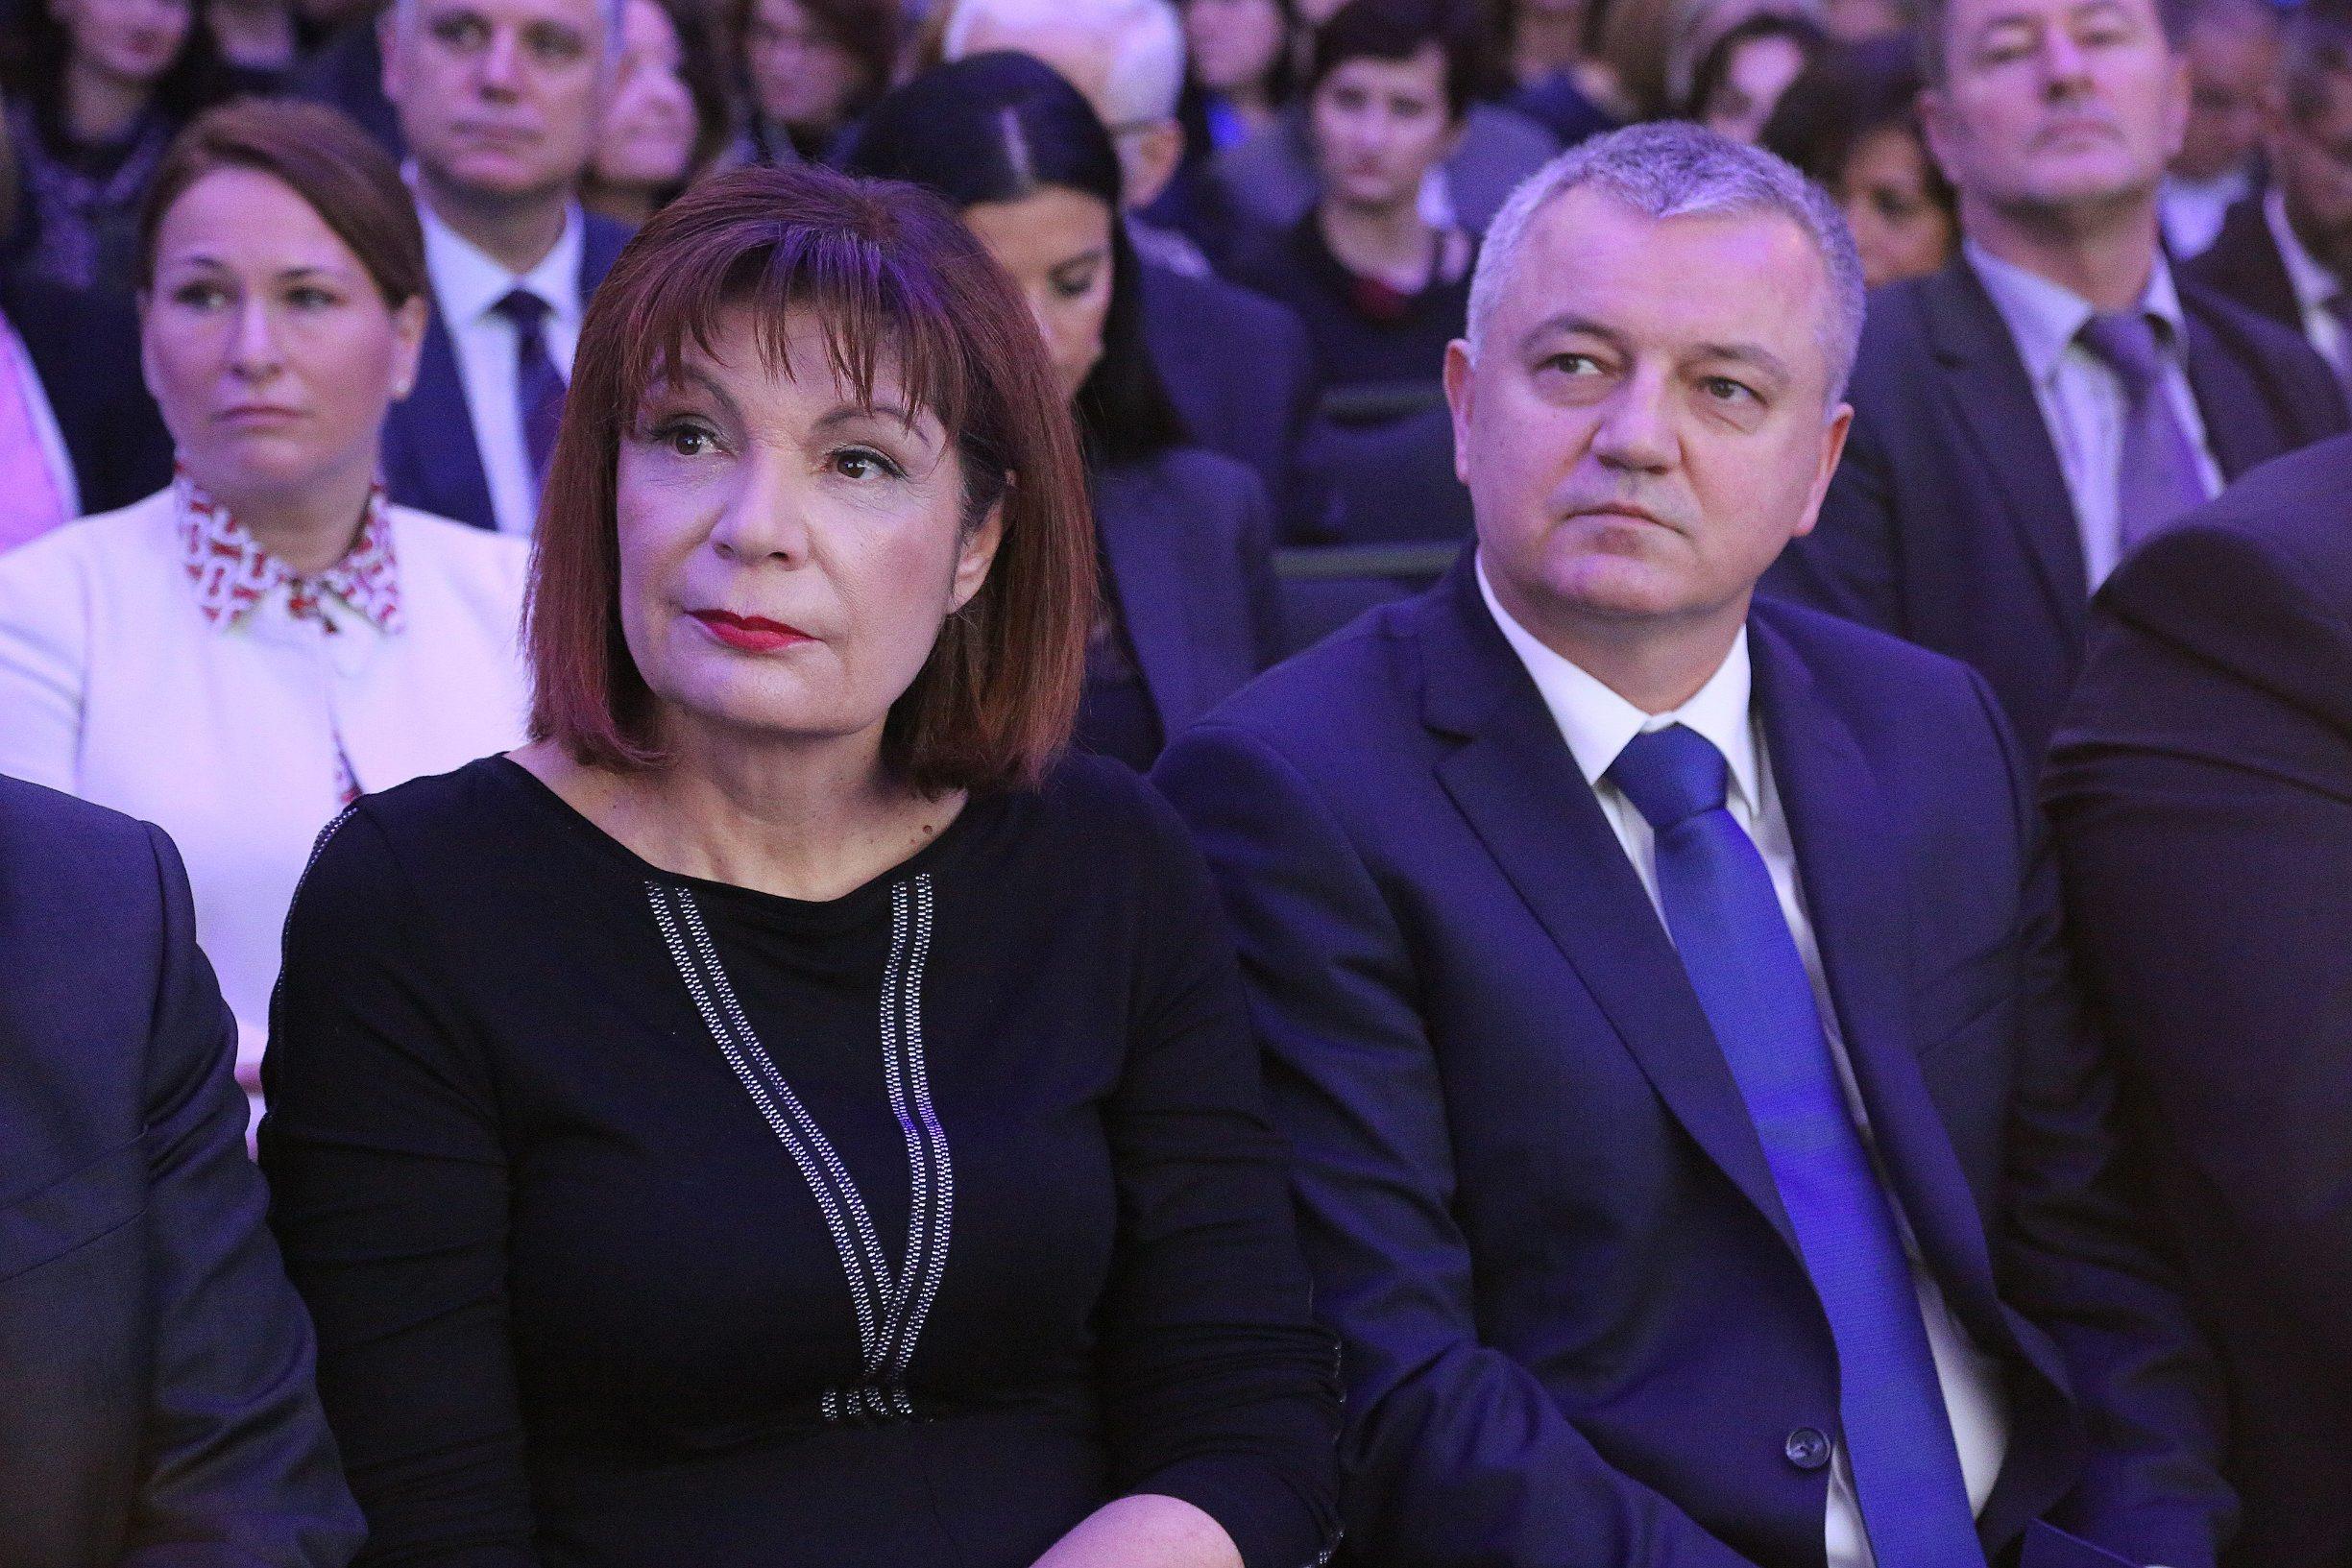 Gordana Deranja, Darko Horvat